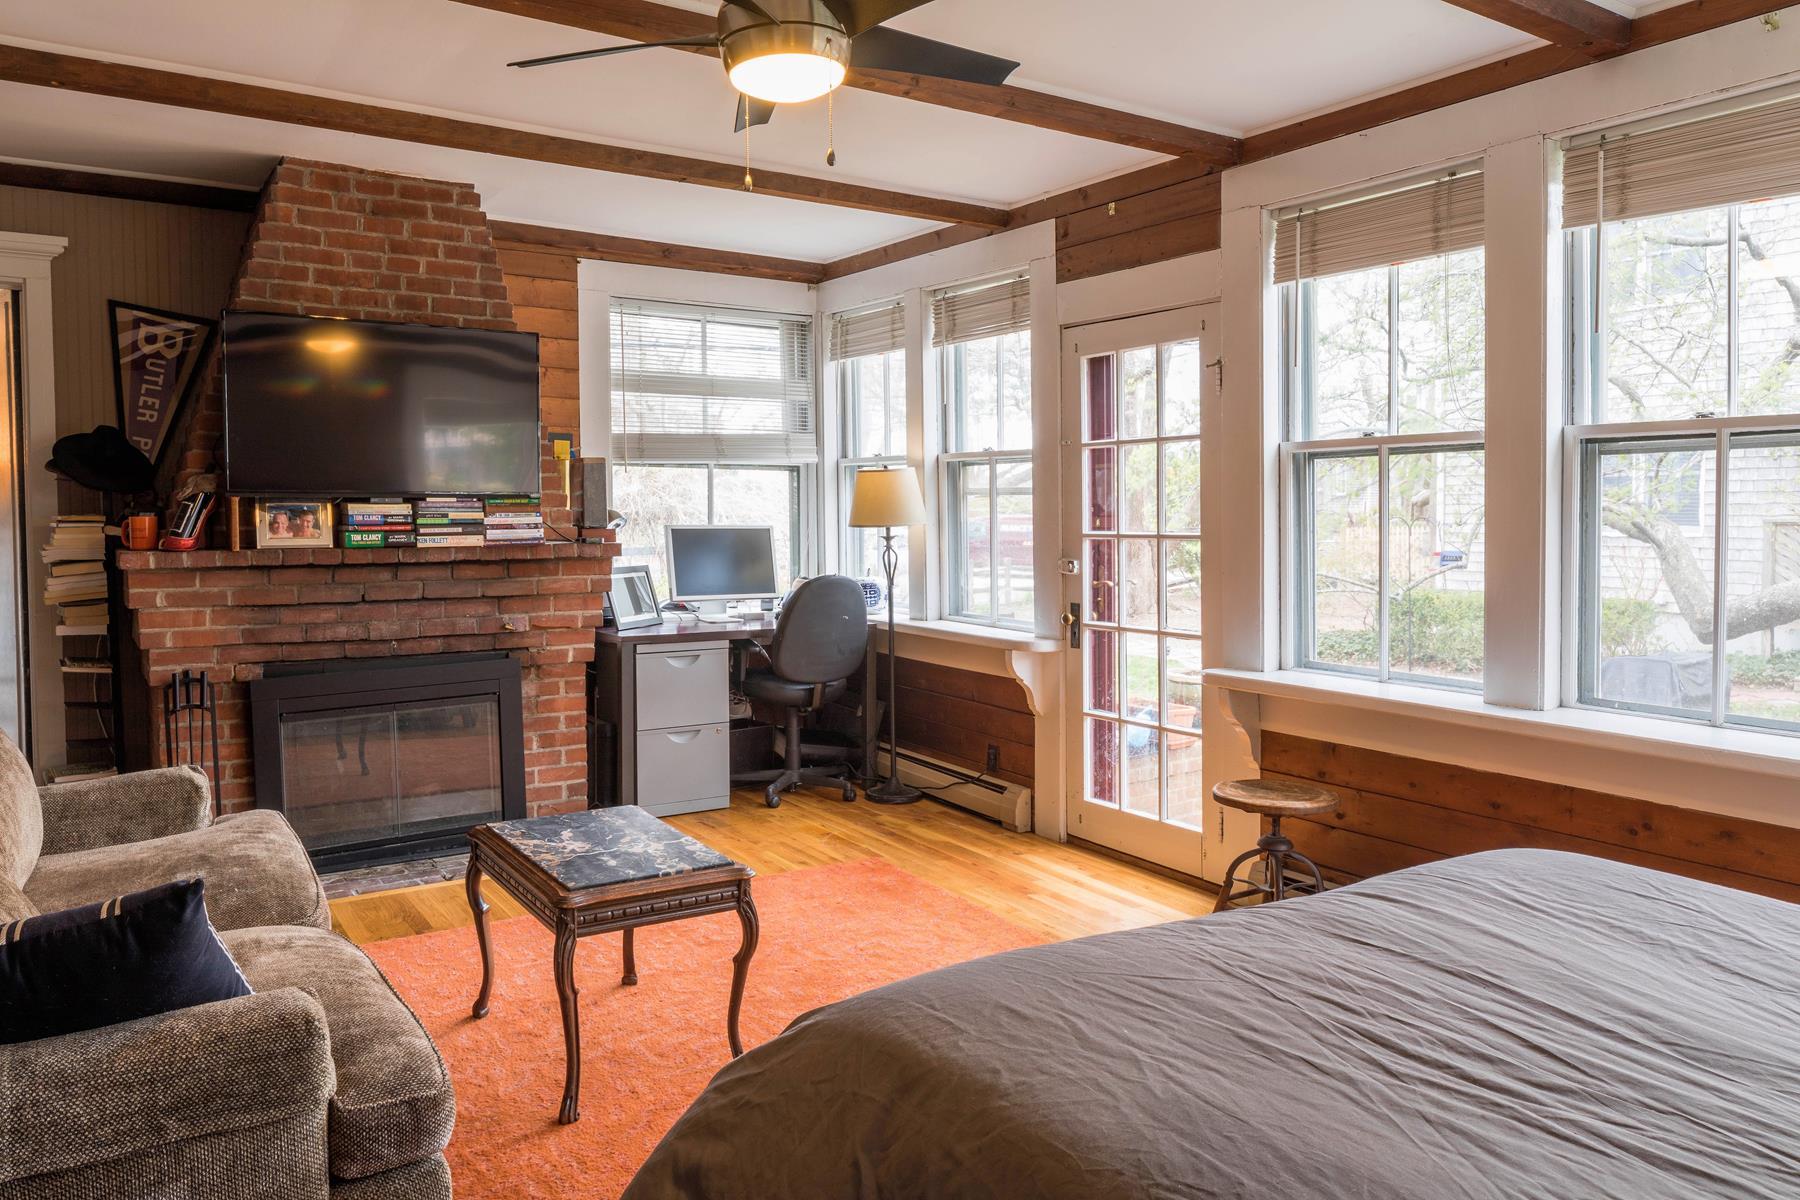 Additional photo for property listing at Snug Cottage 178 Bradford Street Provincetown, Massachusetts 02657 Estados Unidos